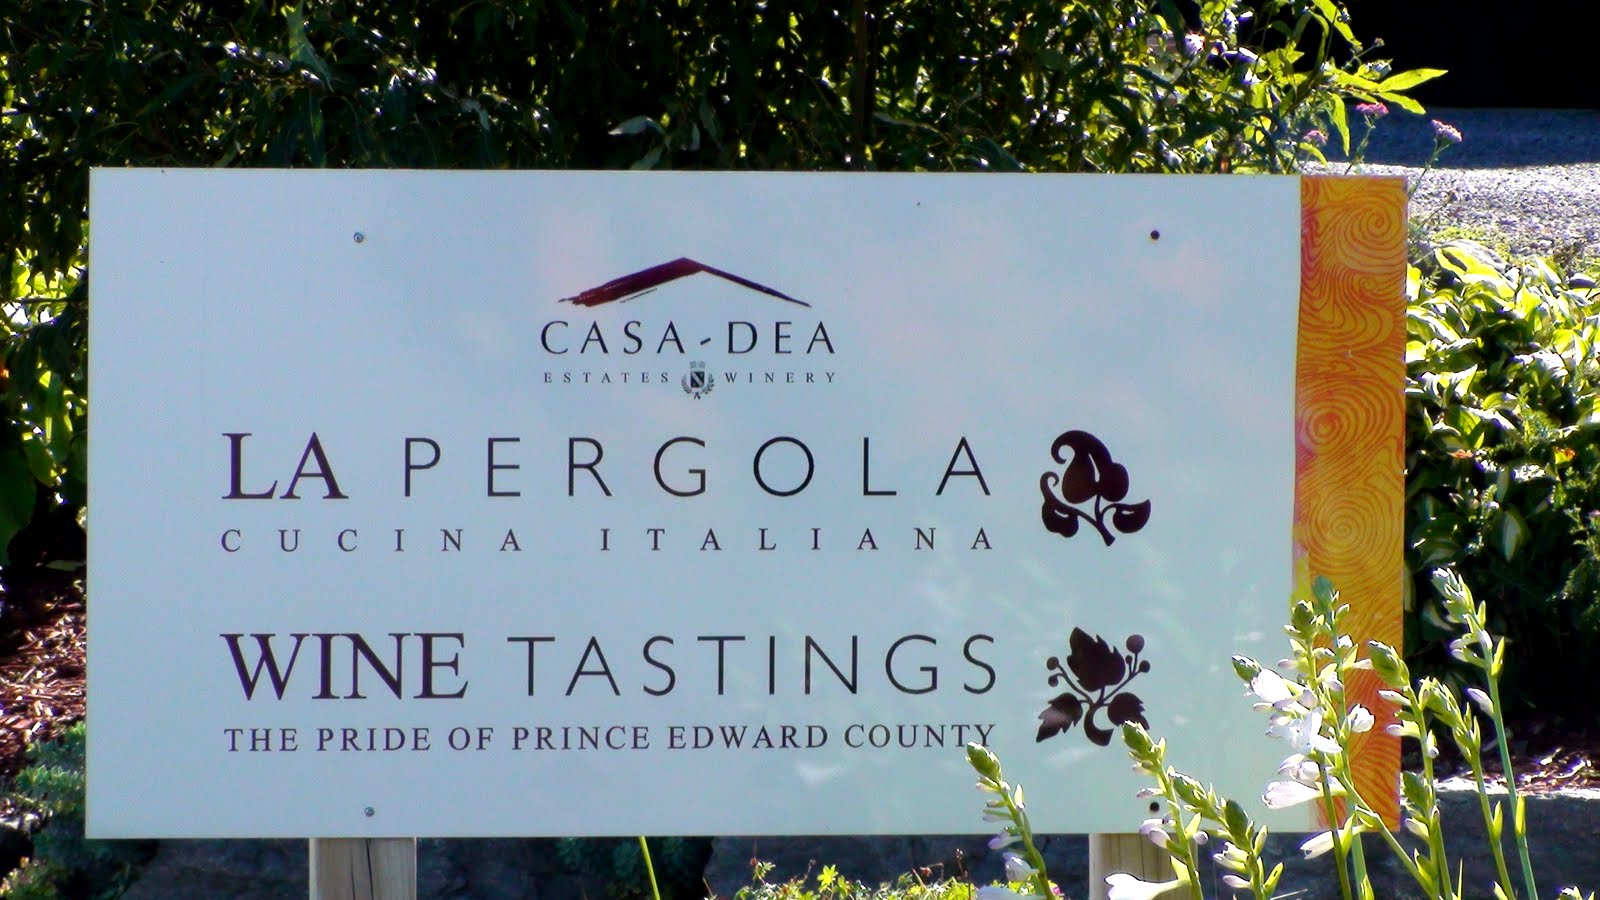 Casa-Dea winery